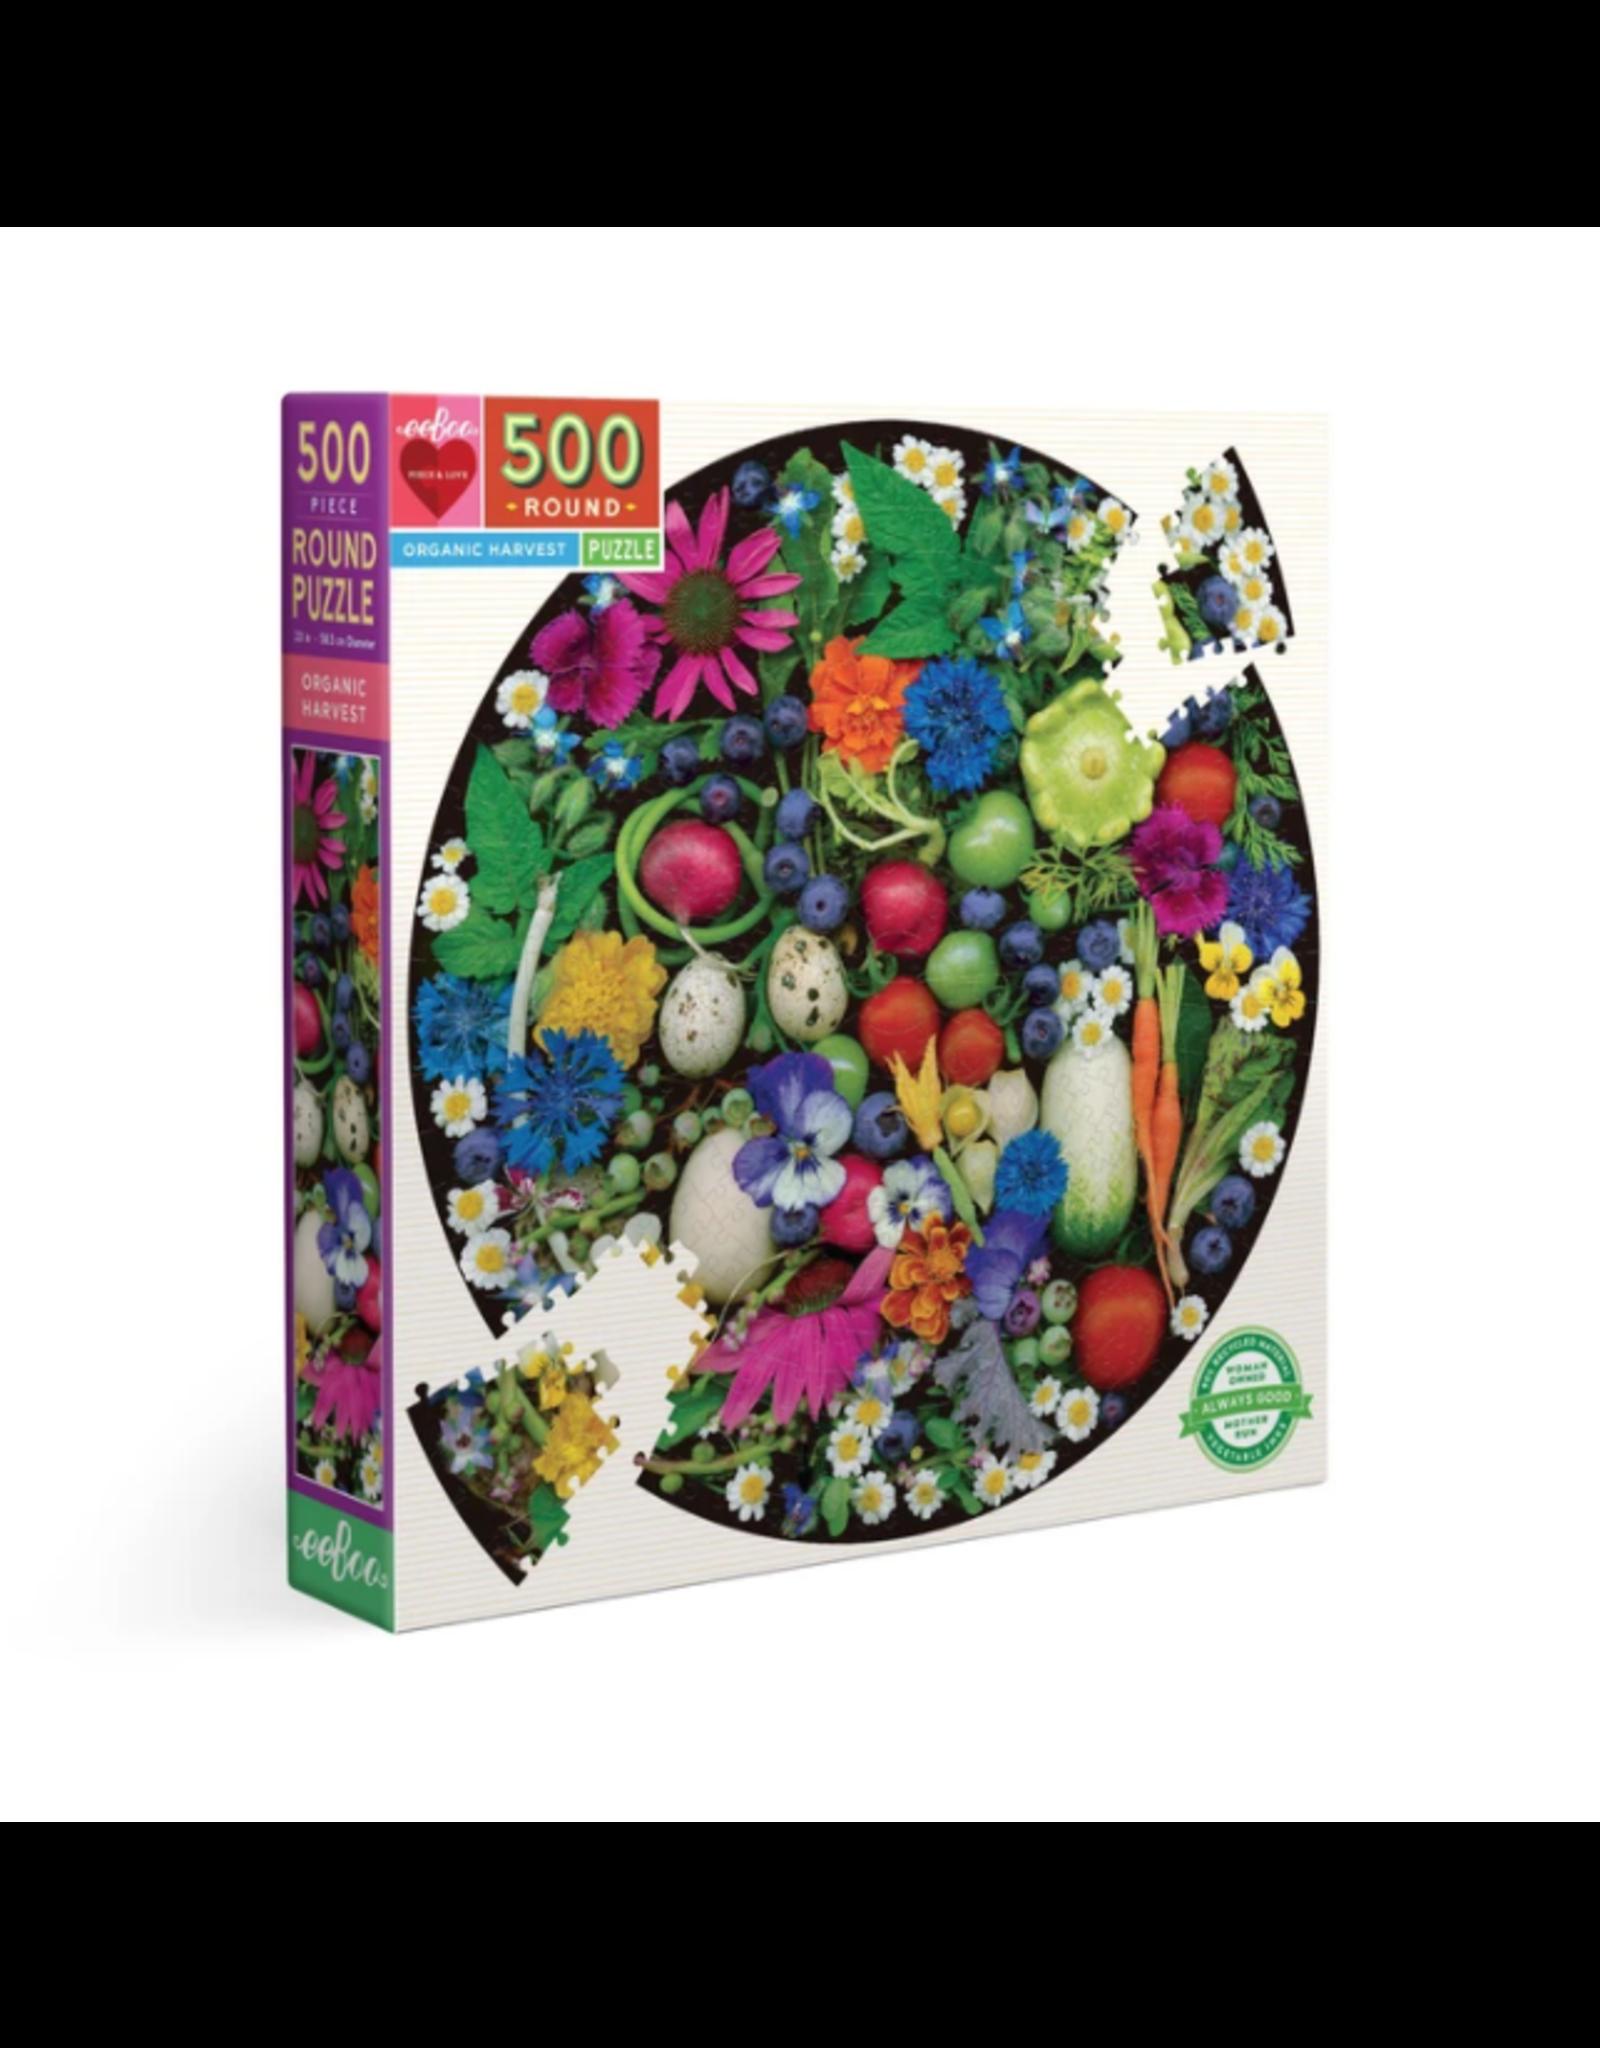 Eeboo 500 pcs. Organic Harvest Round Puzzle